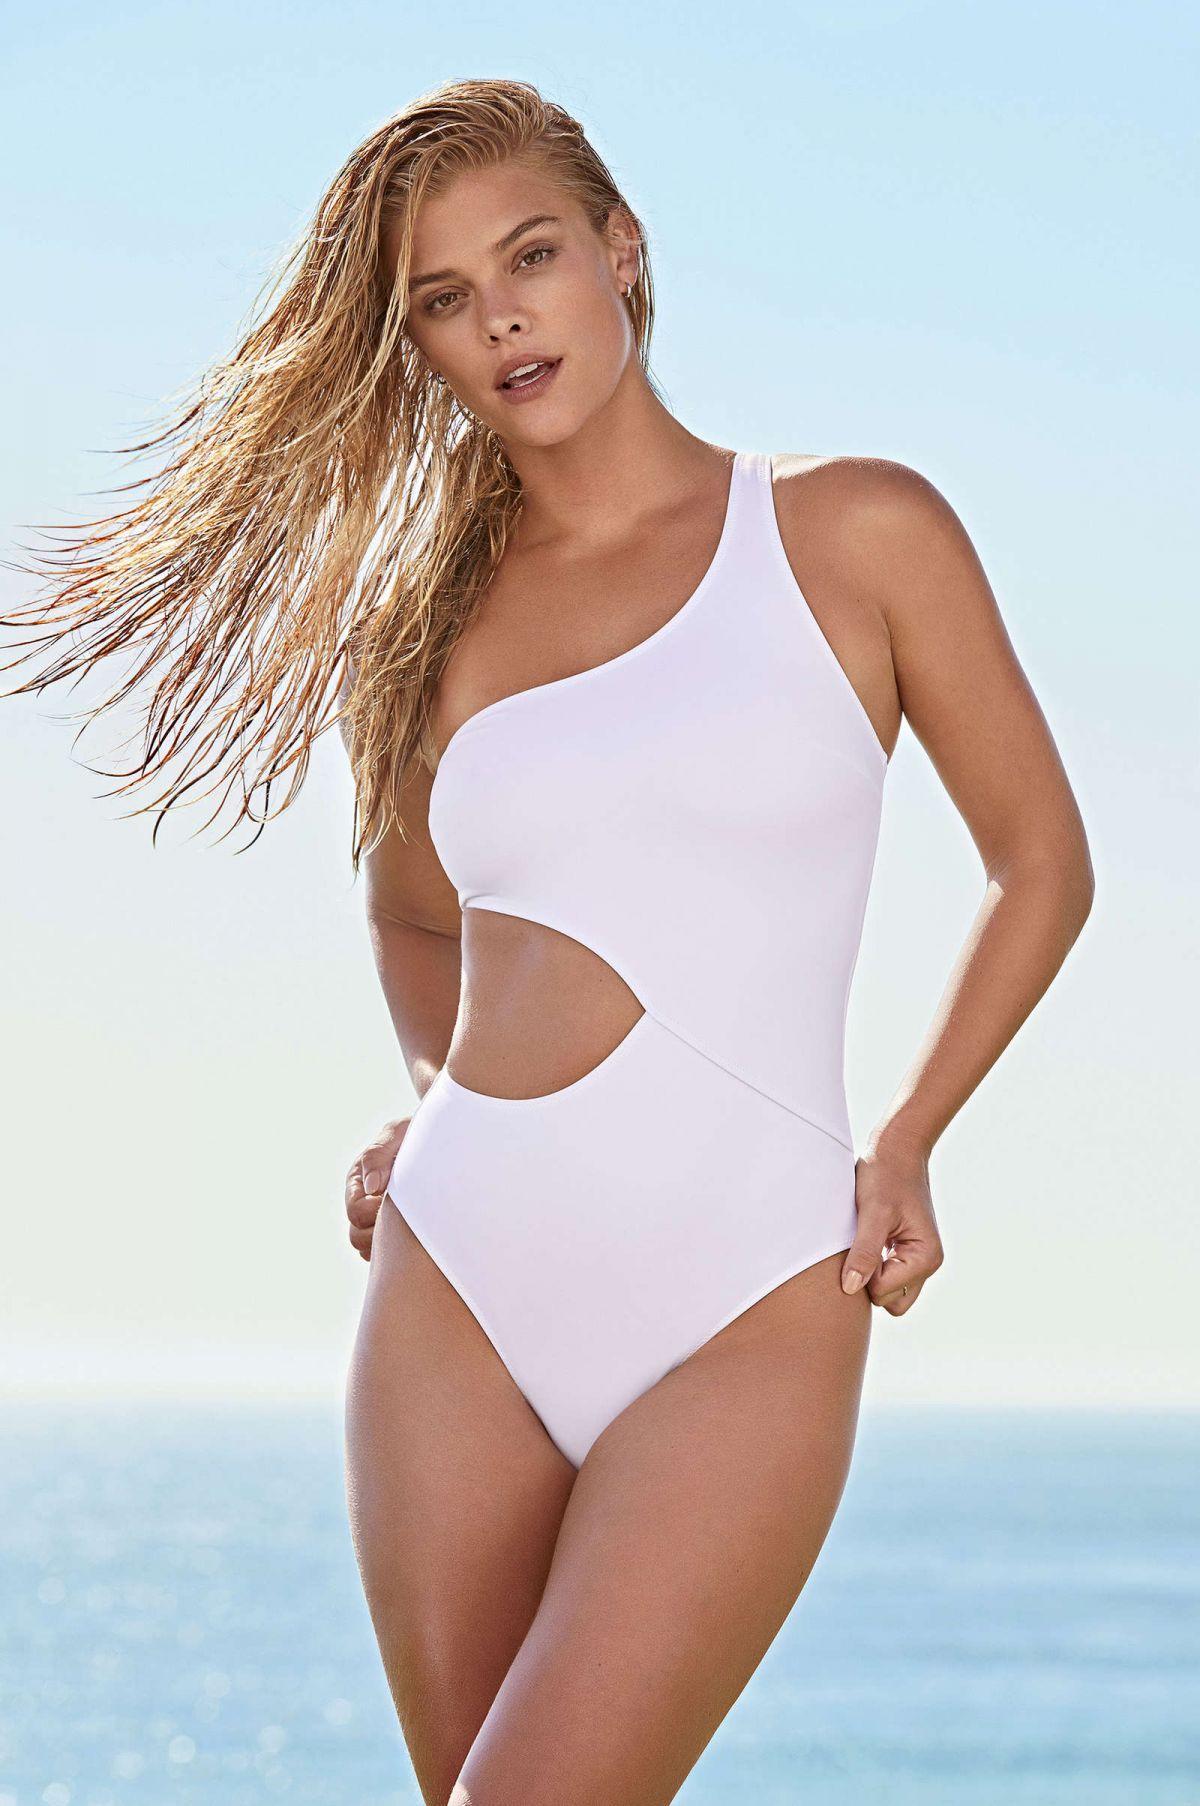 NINA AGDAL for Shopbop Swim & Beachwear 2017 Collection